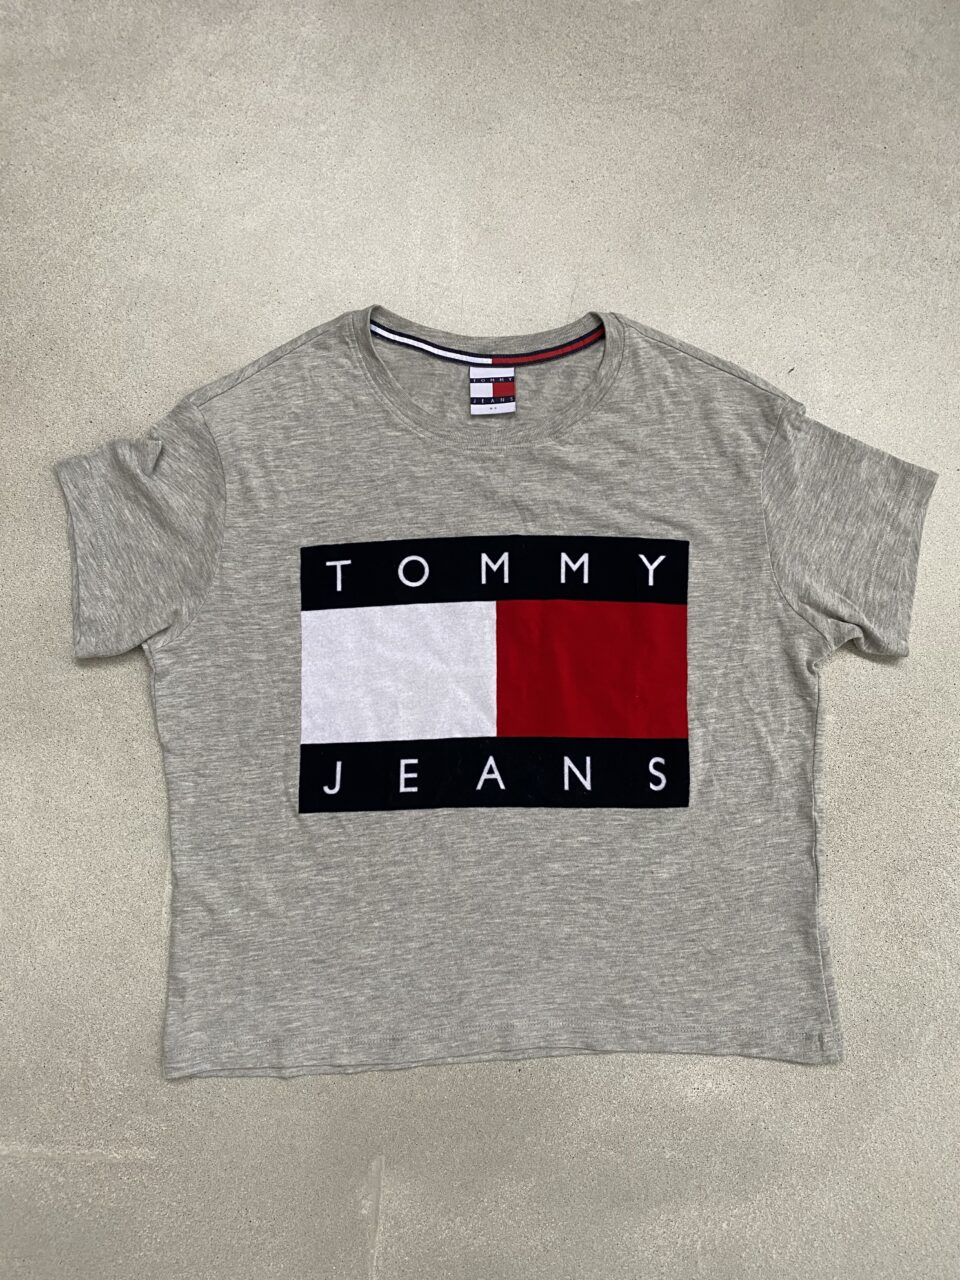 Grijs t-shirt met Tommy Hilfiger logo op betonvloer